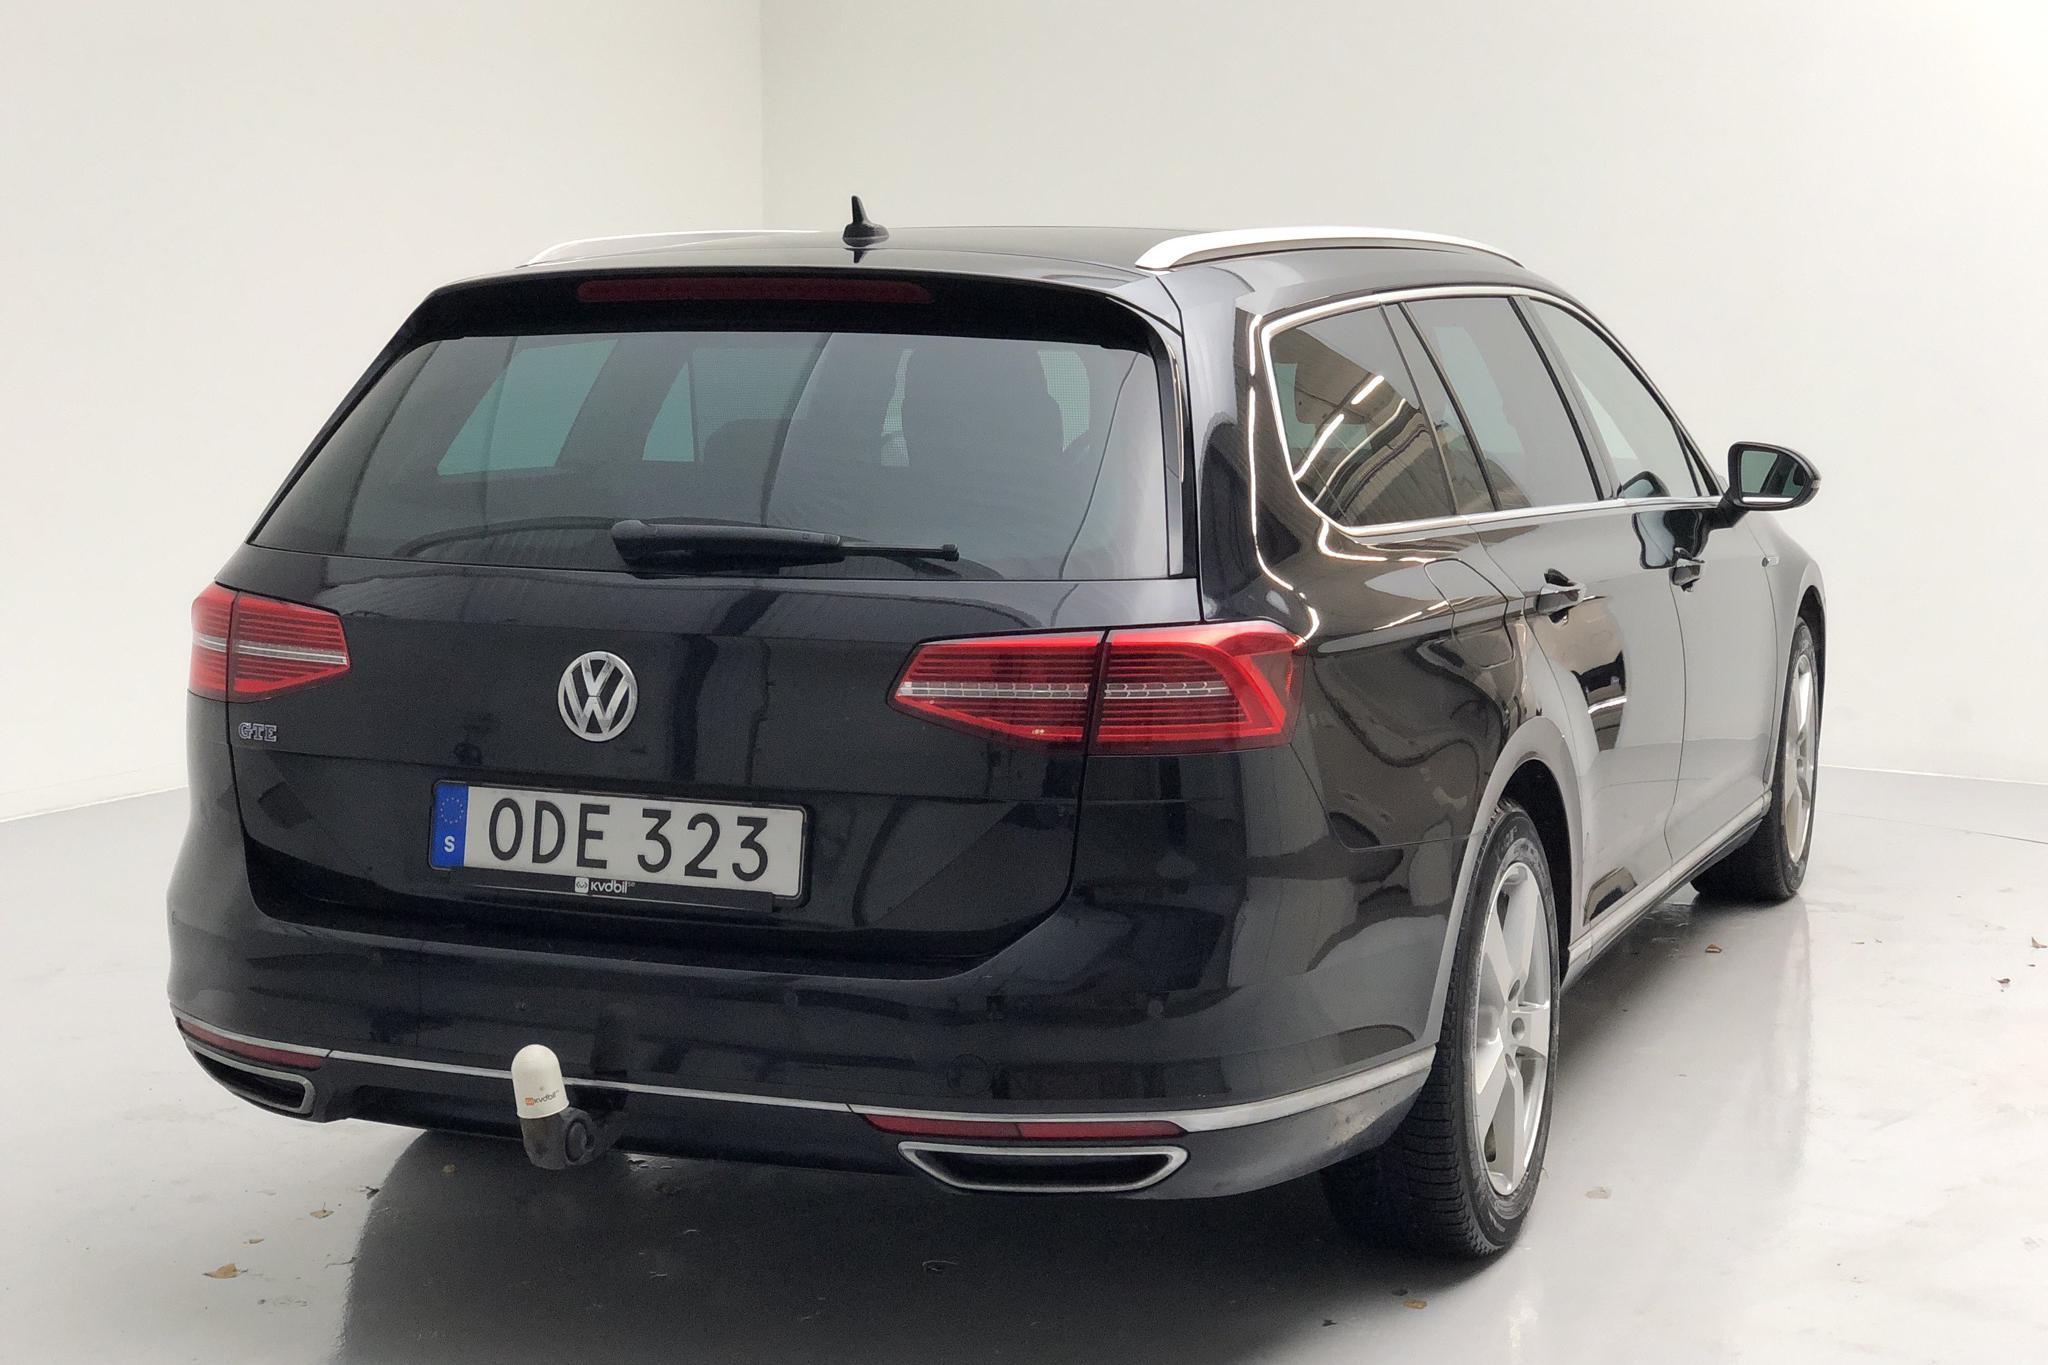 VW Passat 1.4 Plug-in-Hybrid Sportscombi (218hk) - 9 317 mil - Automat - svart - 2017